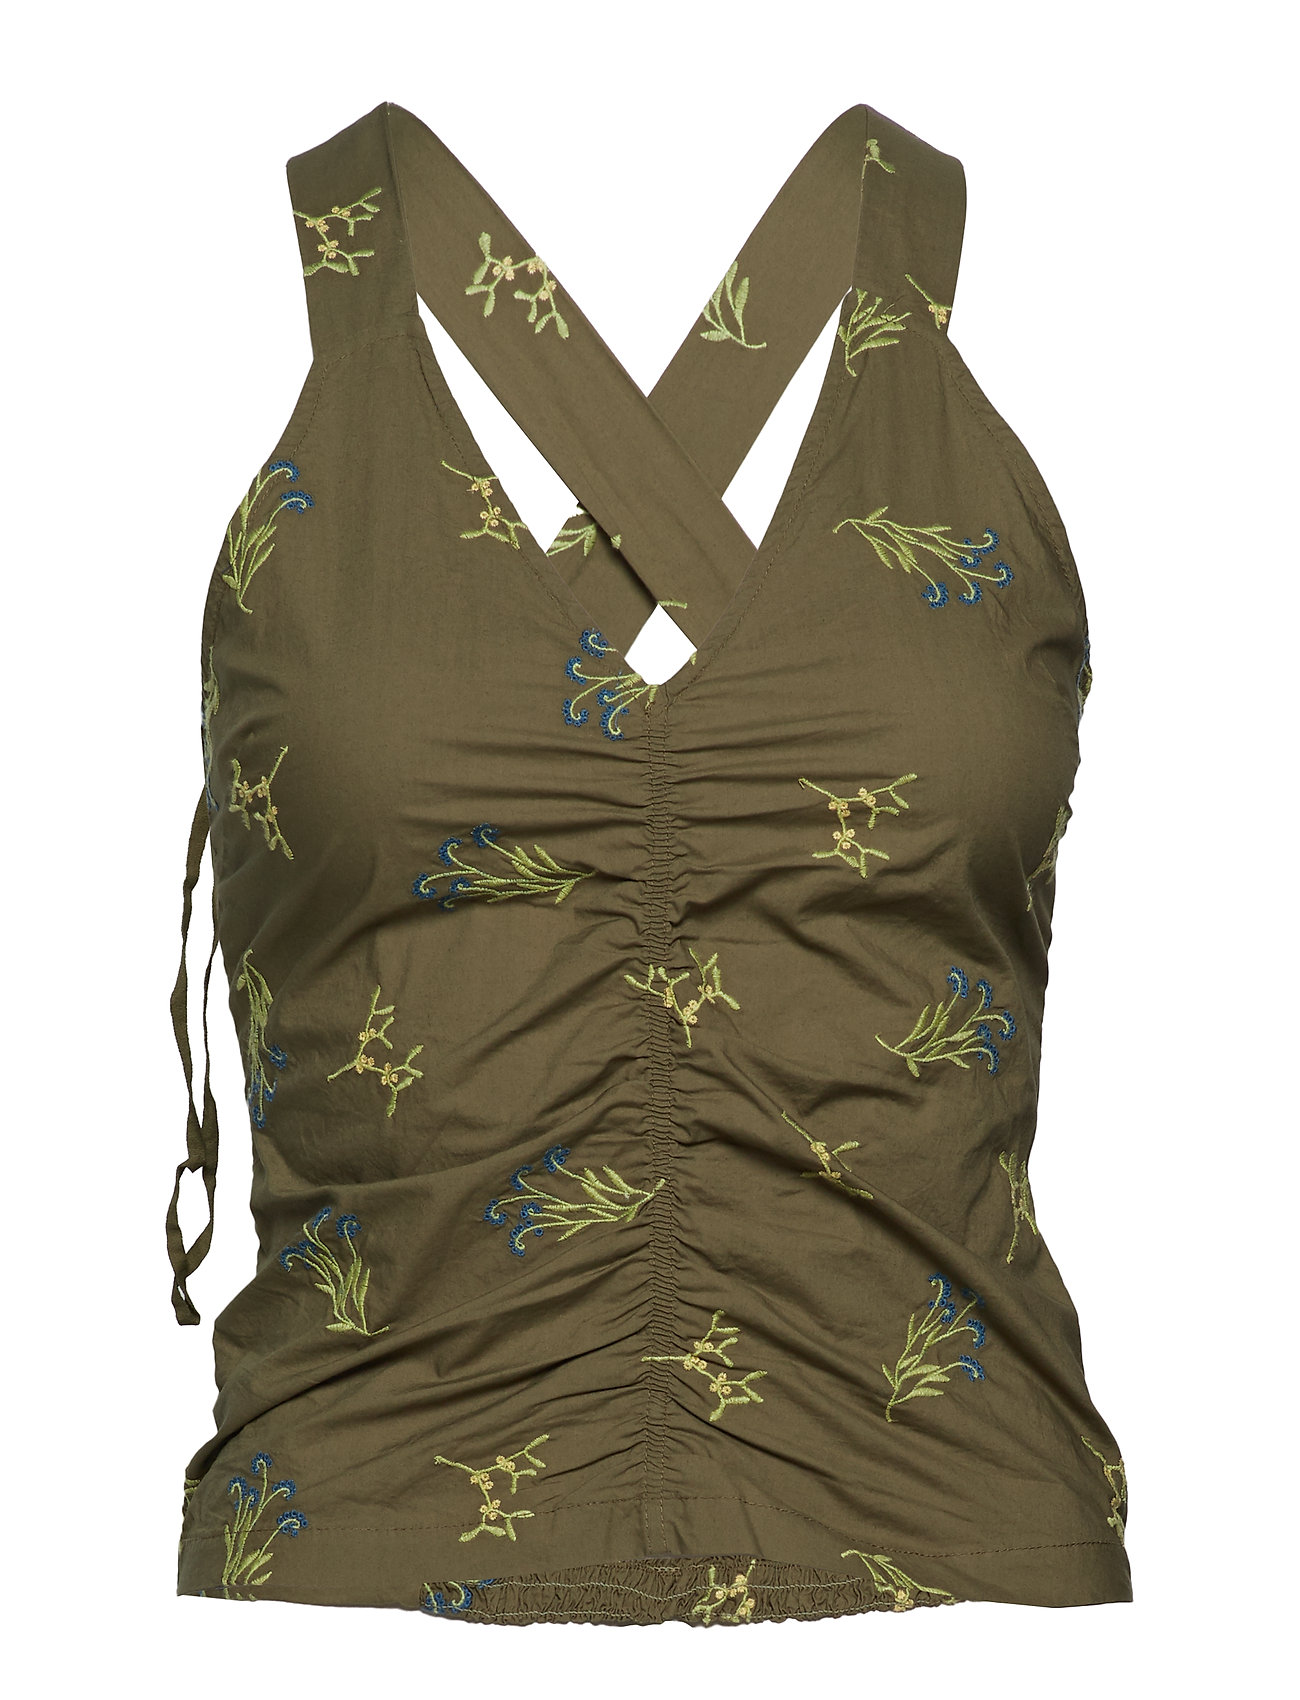 RODEBJER Amma Embroidery - GREEN SAFARI